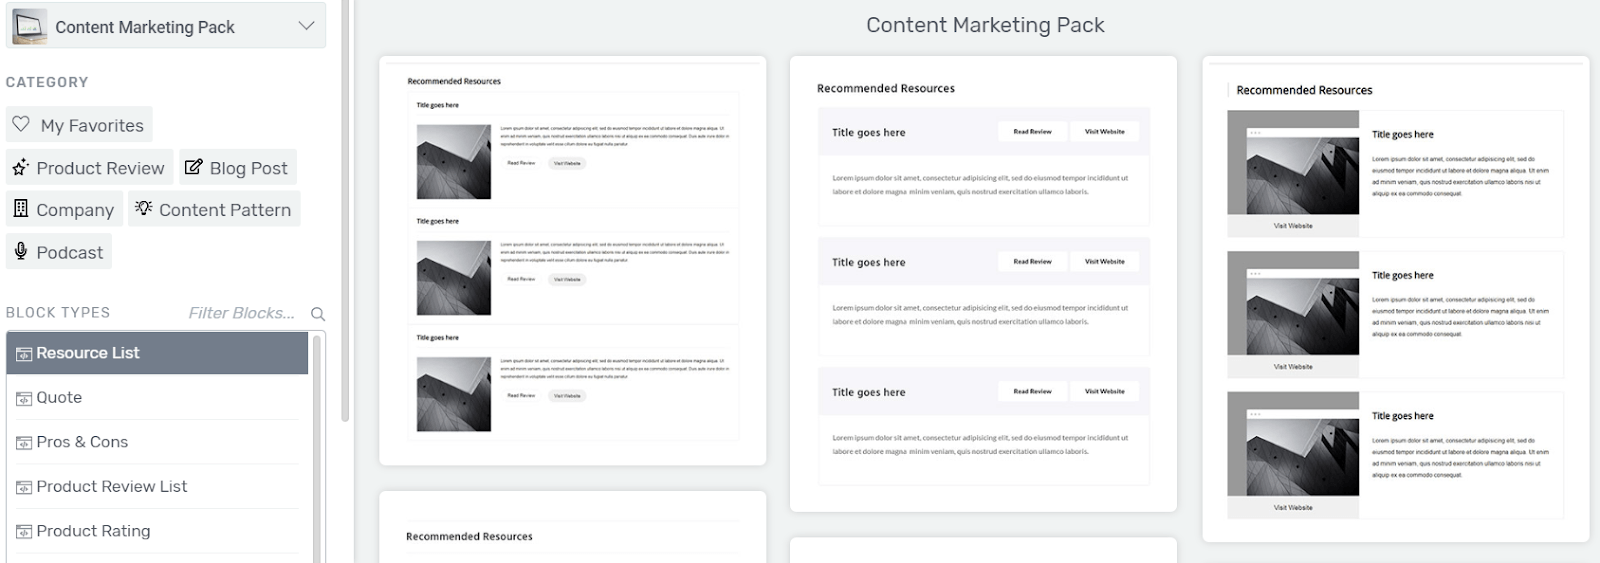 Resources List SEO content